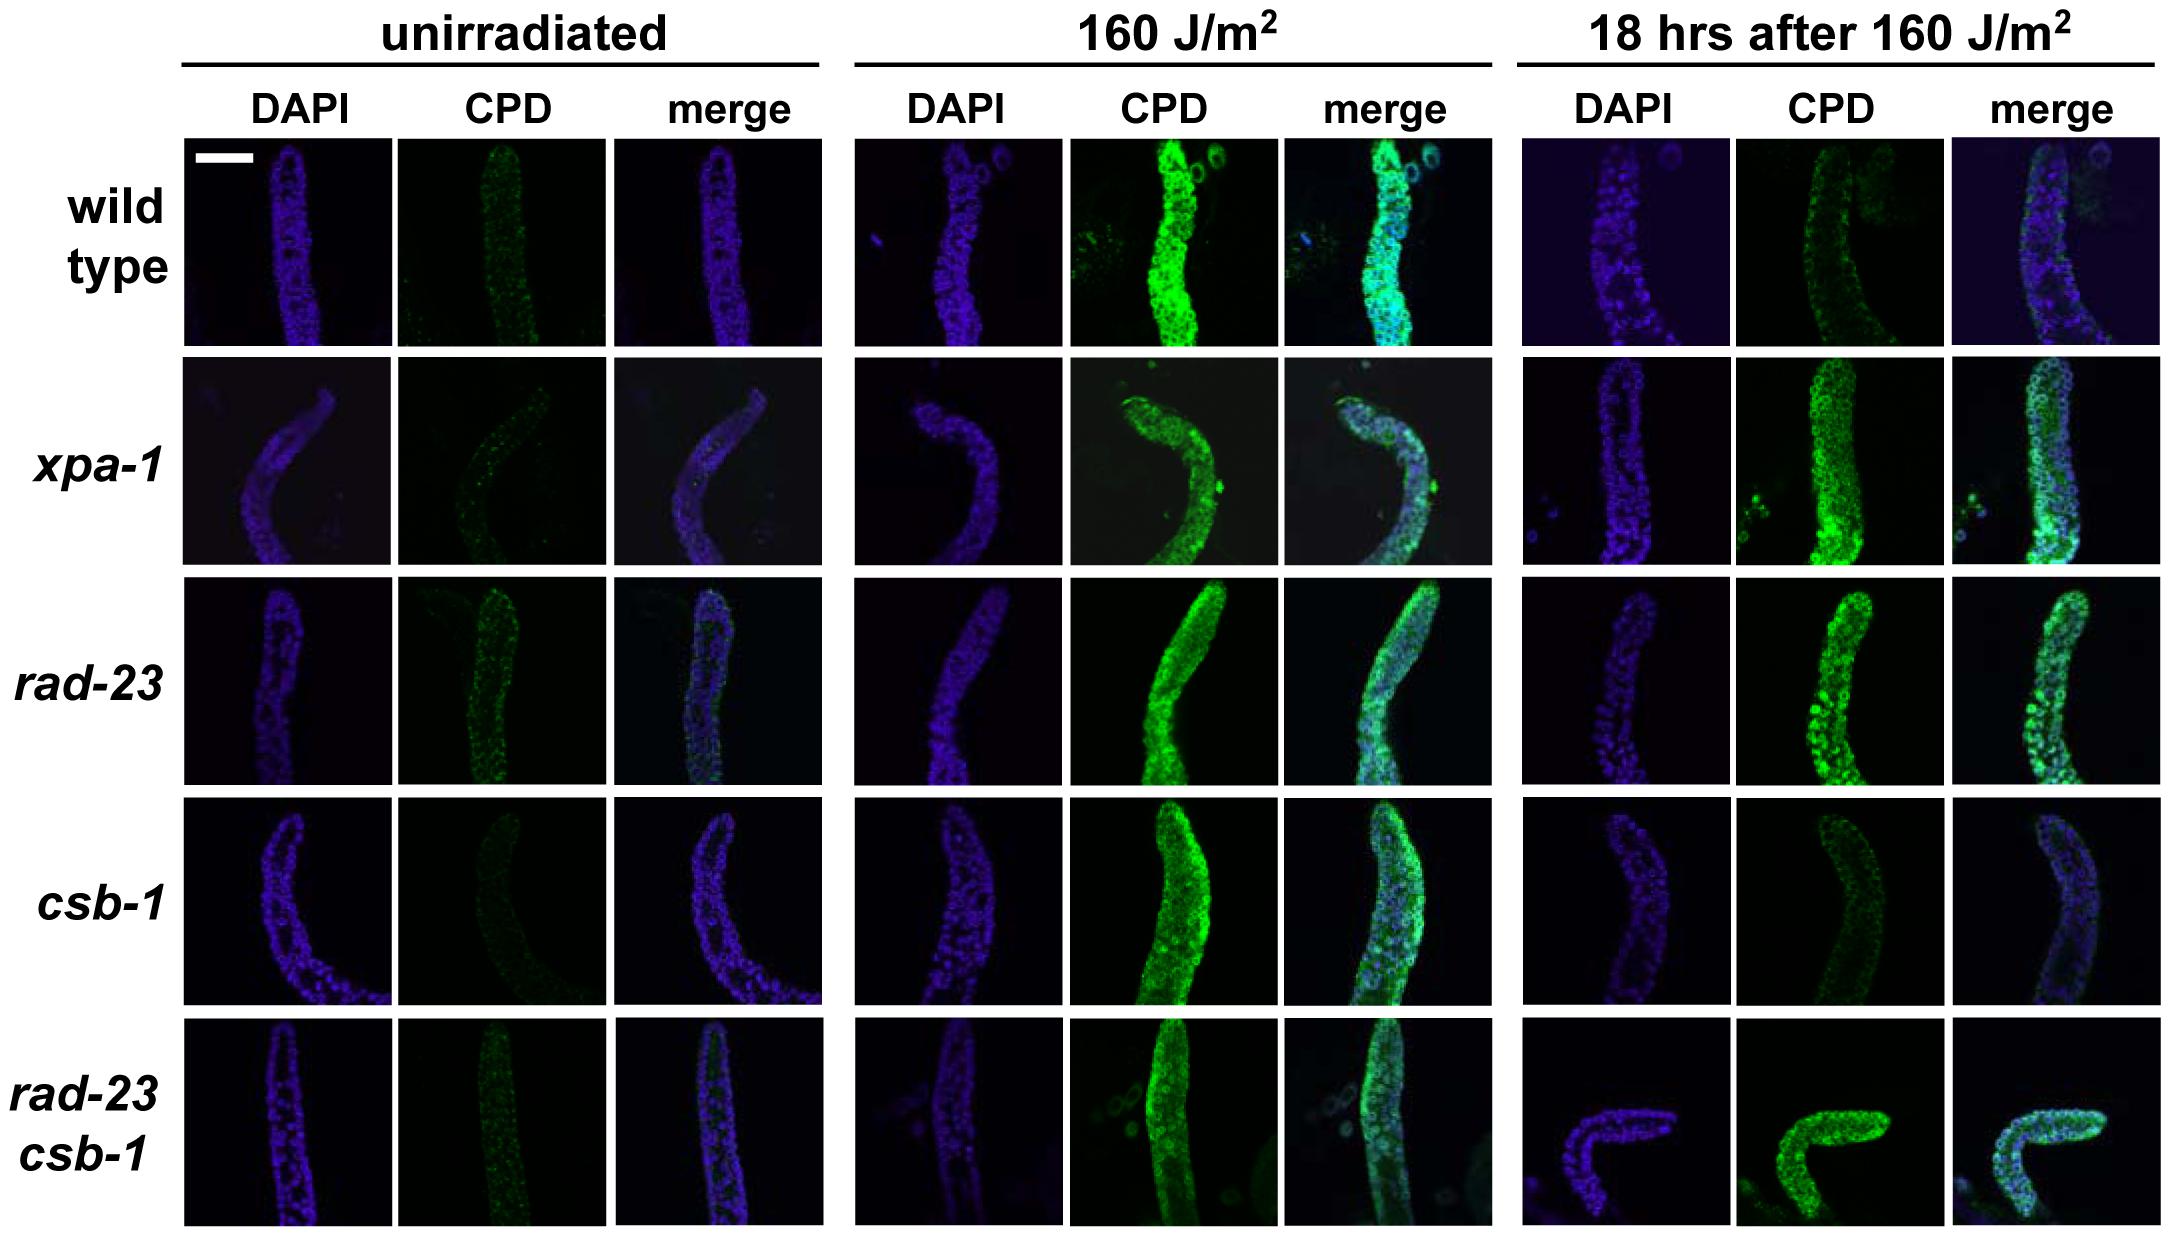 CPD repair in <i>C. elegans</i> germ cells.